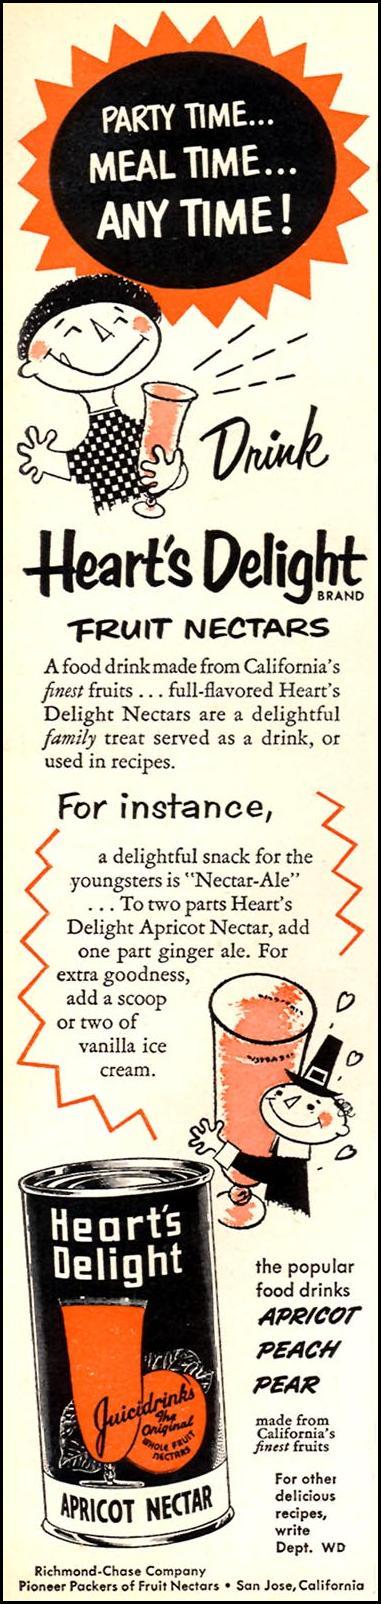 HEART'S DELIGHT FRUIT NECTARS WOMAN'S DAY 02/01/1954 p. 140